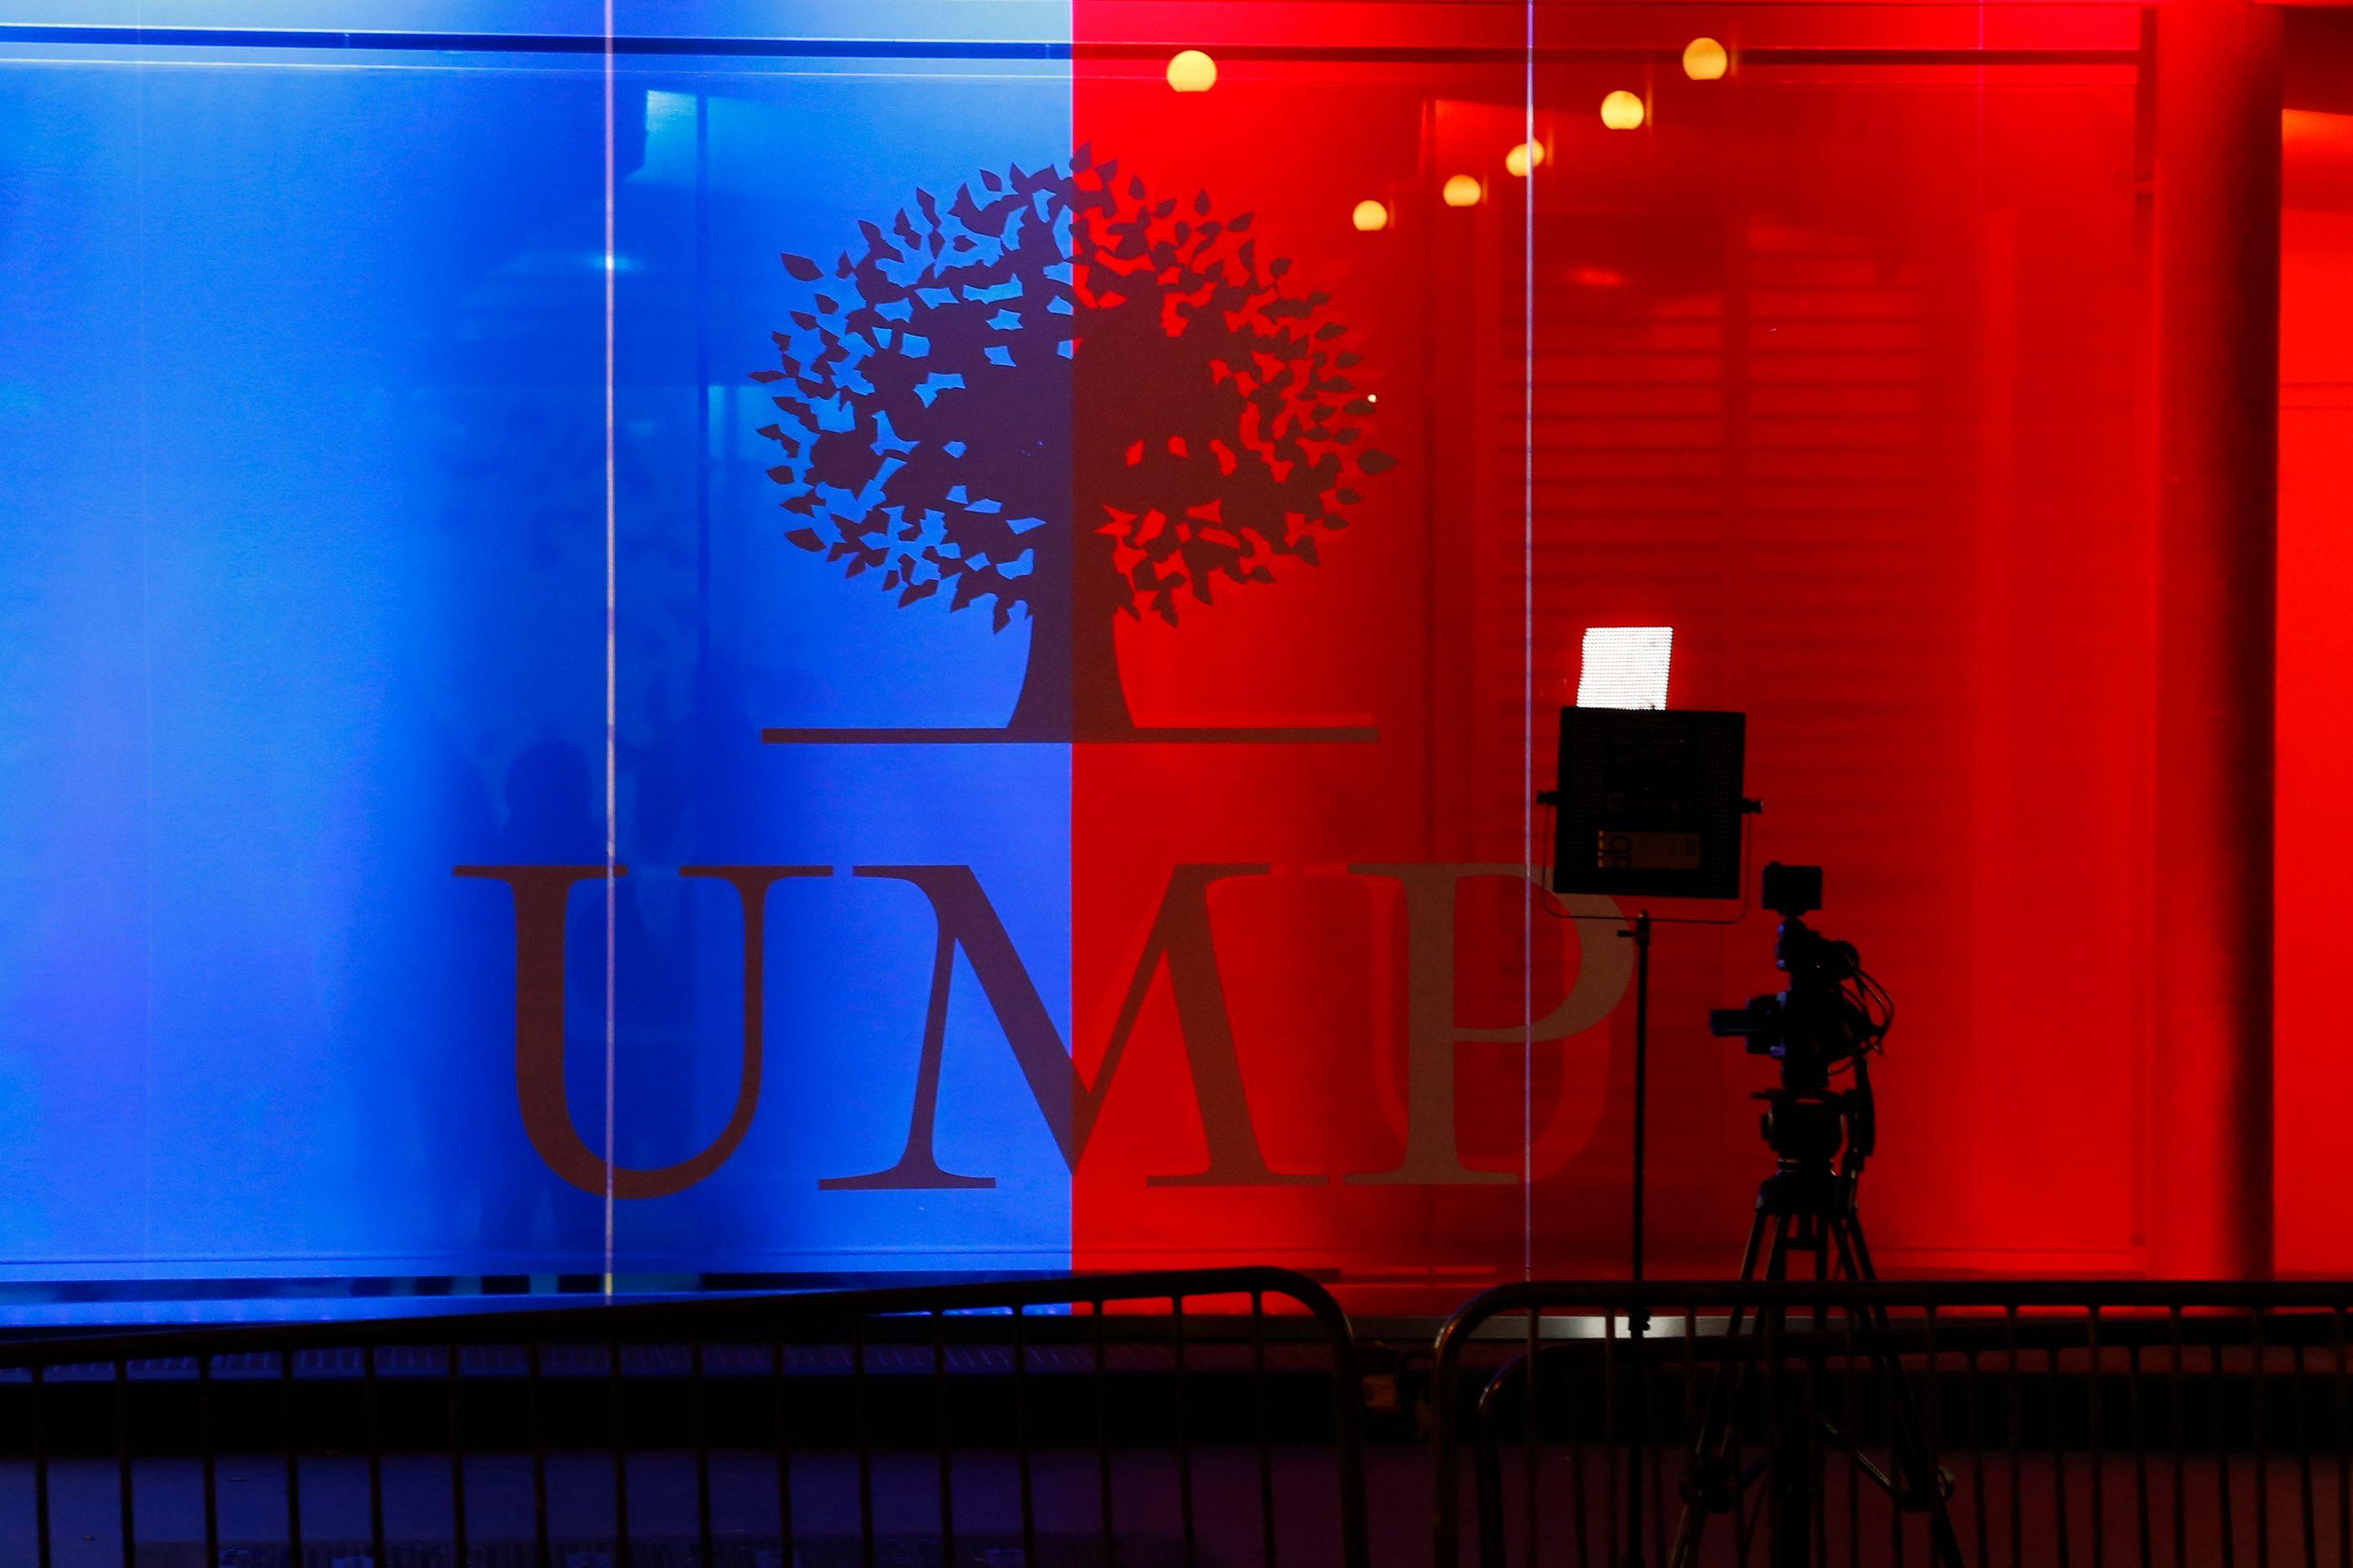 Le conseil national de l'UMP a lieu ce samedi